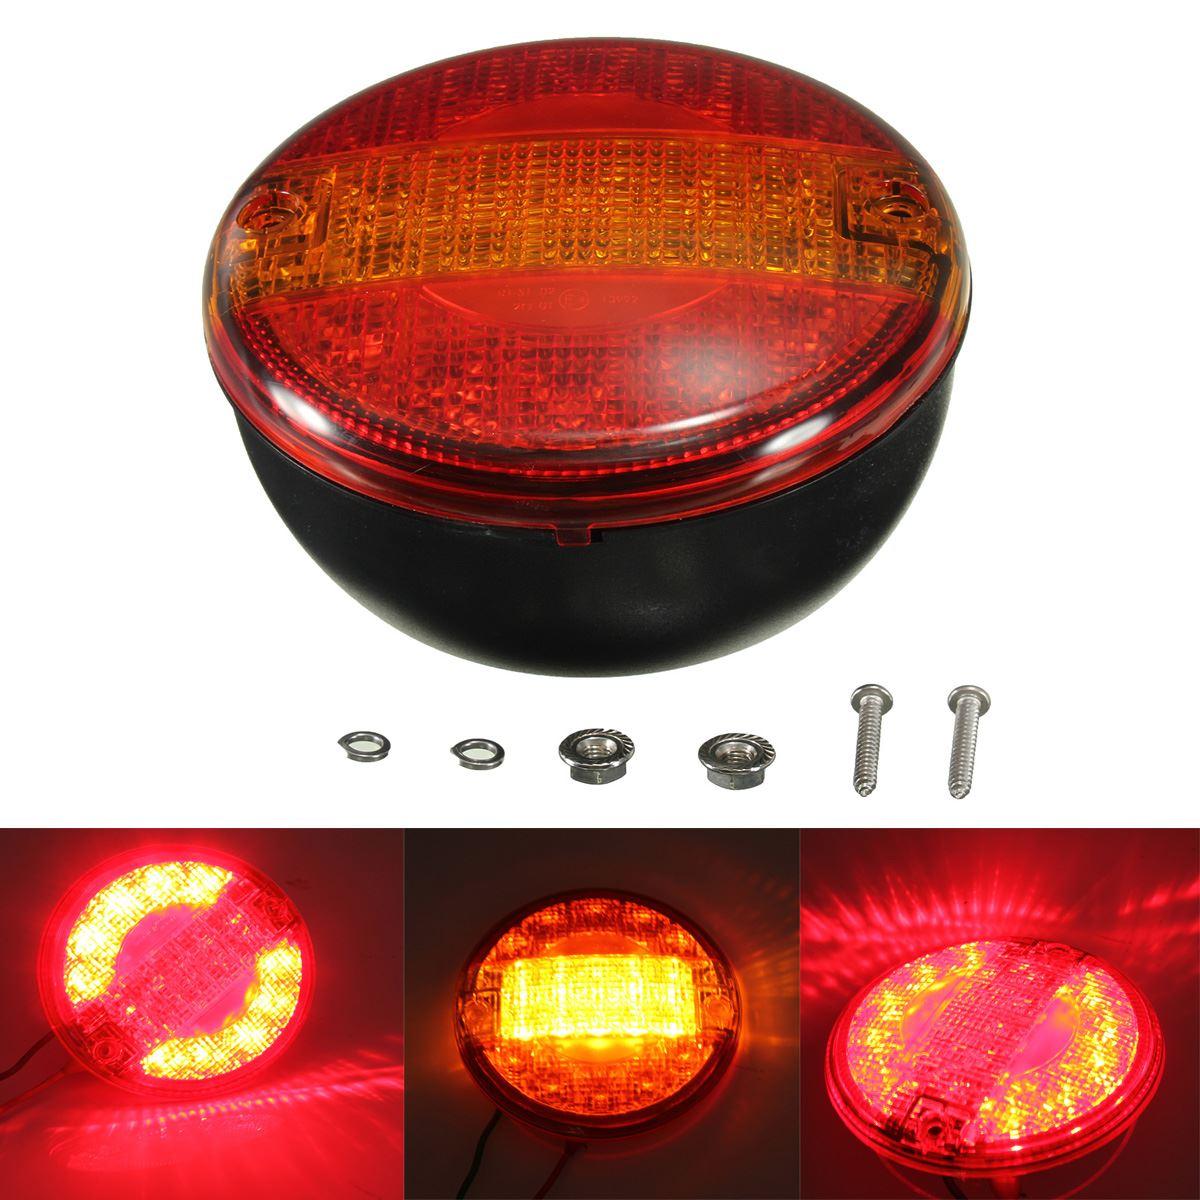 12/24V Universal LED Rear Tail Stop Indicator Light Round Truck Caravan E-marker